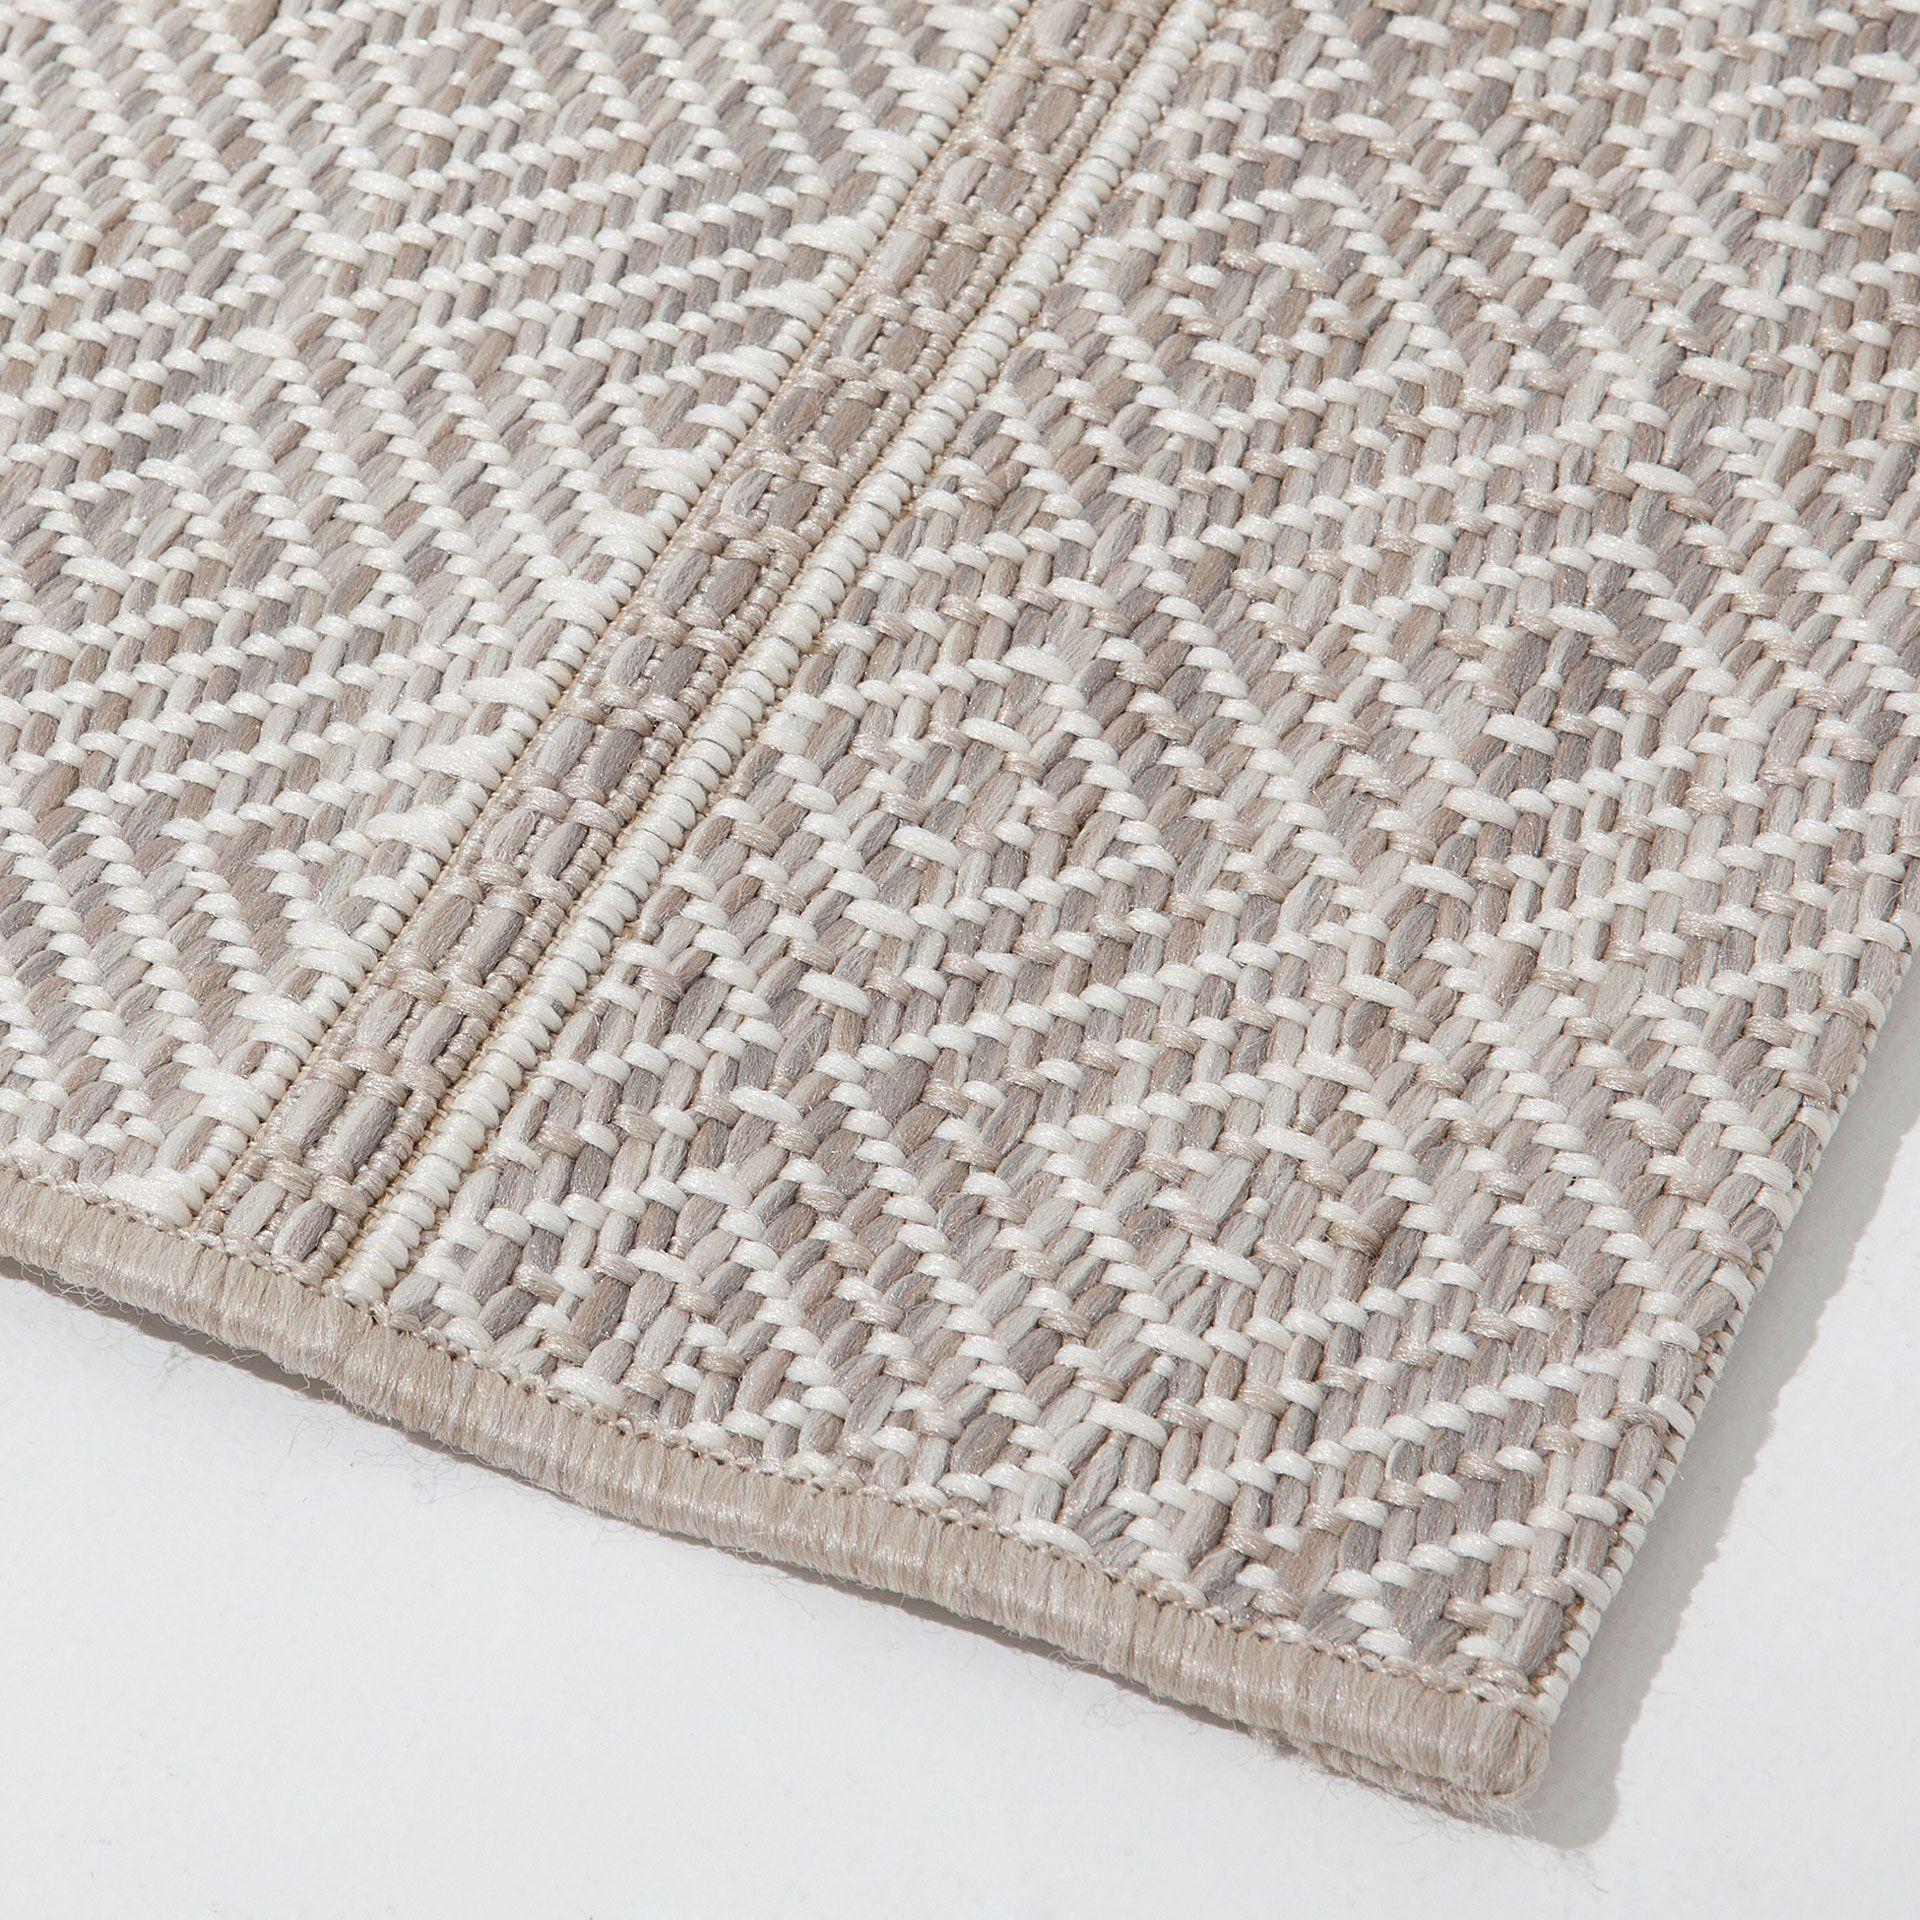 Geometric Shape Rug Indoor And Outdoor